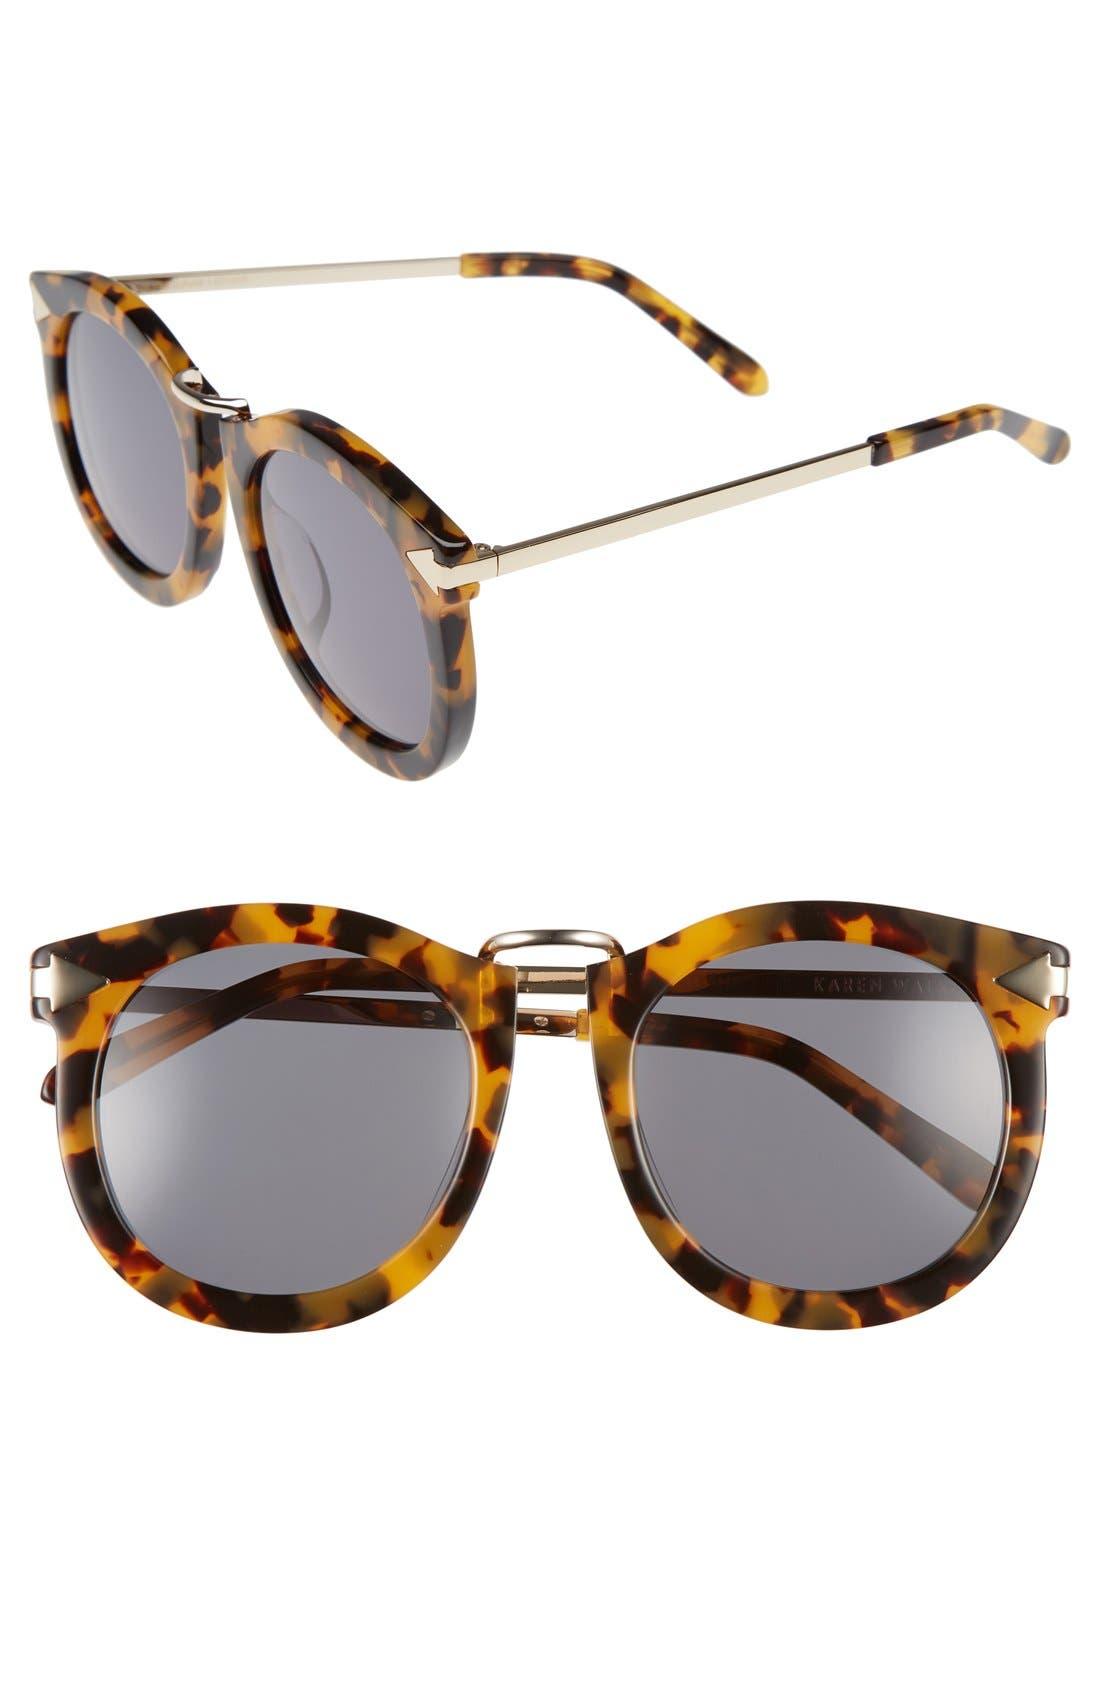 Alternative Fit Super Lunar - Arrowed by Karen 50mm Sunglasses,                             Main thumbnail 2, color,